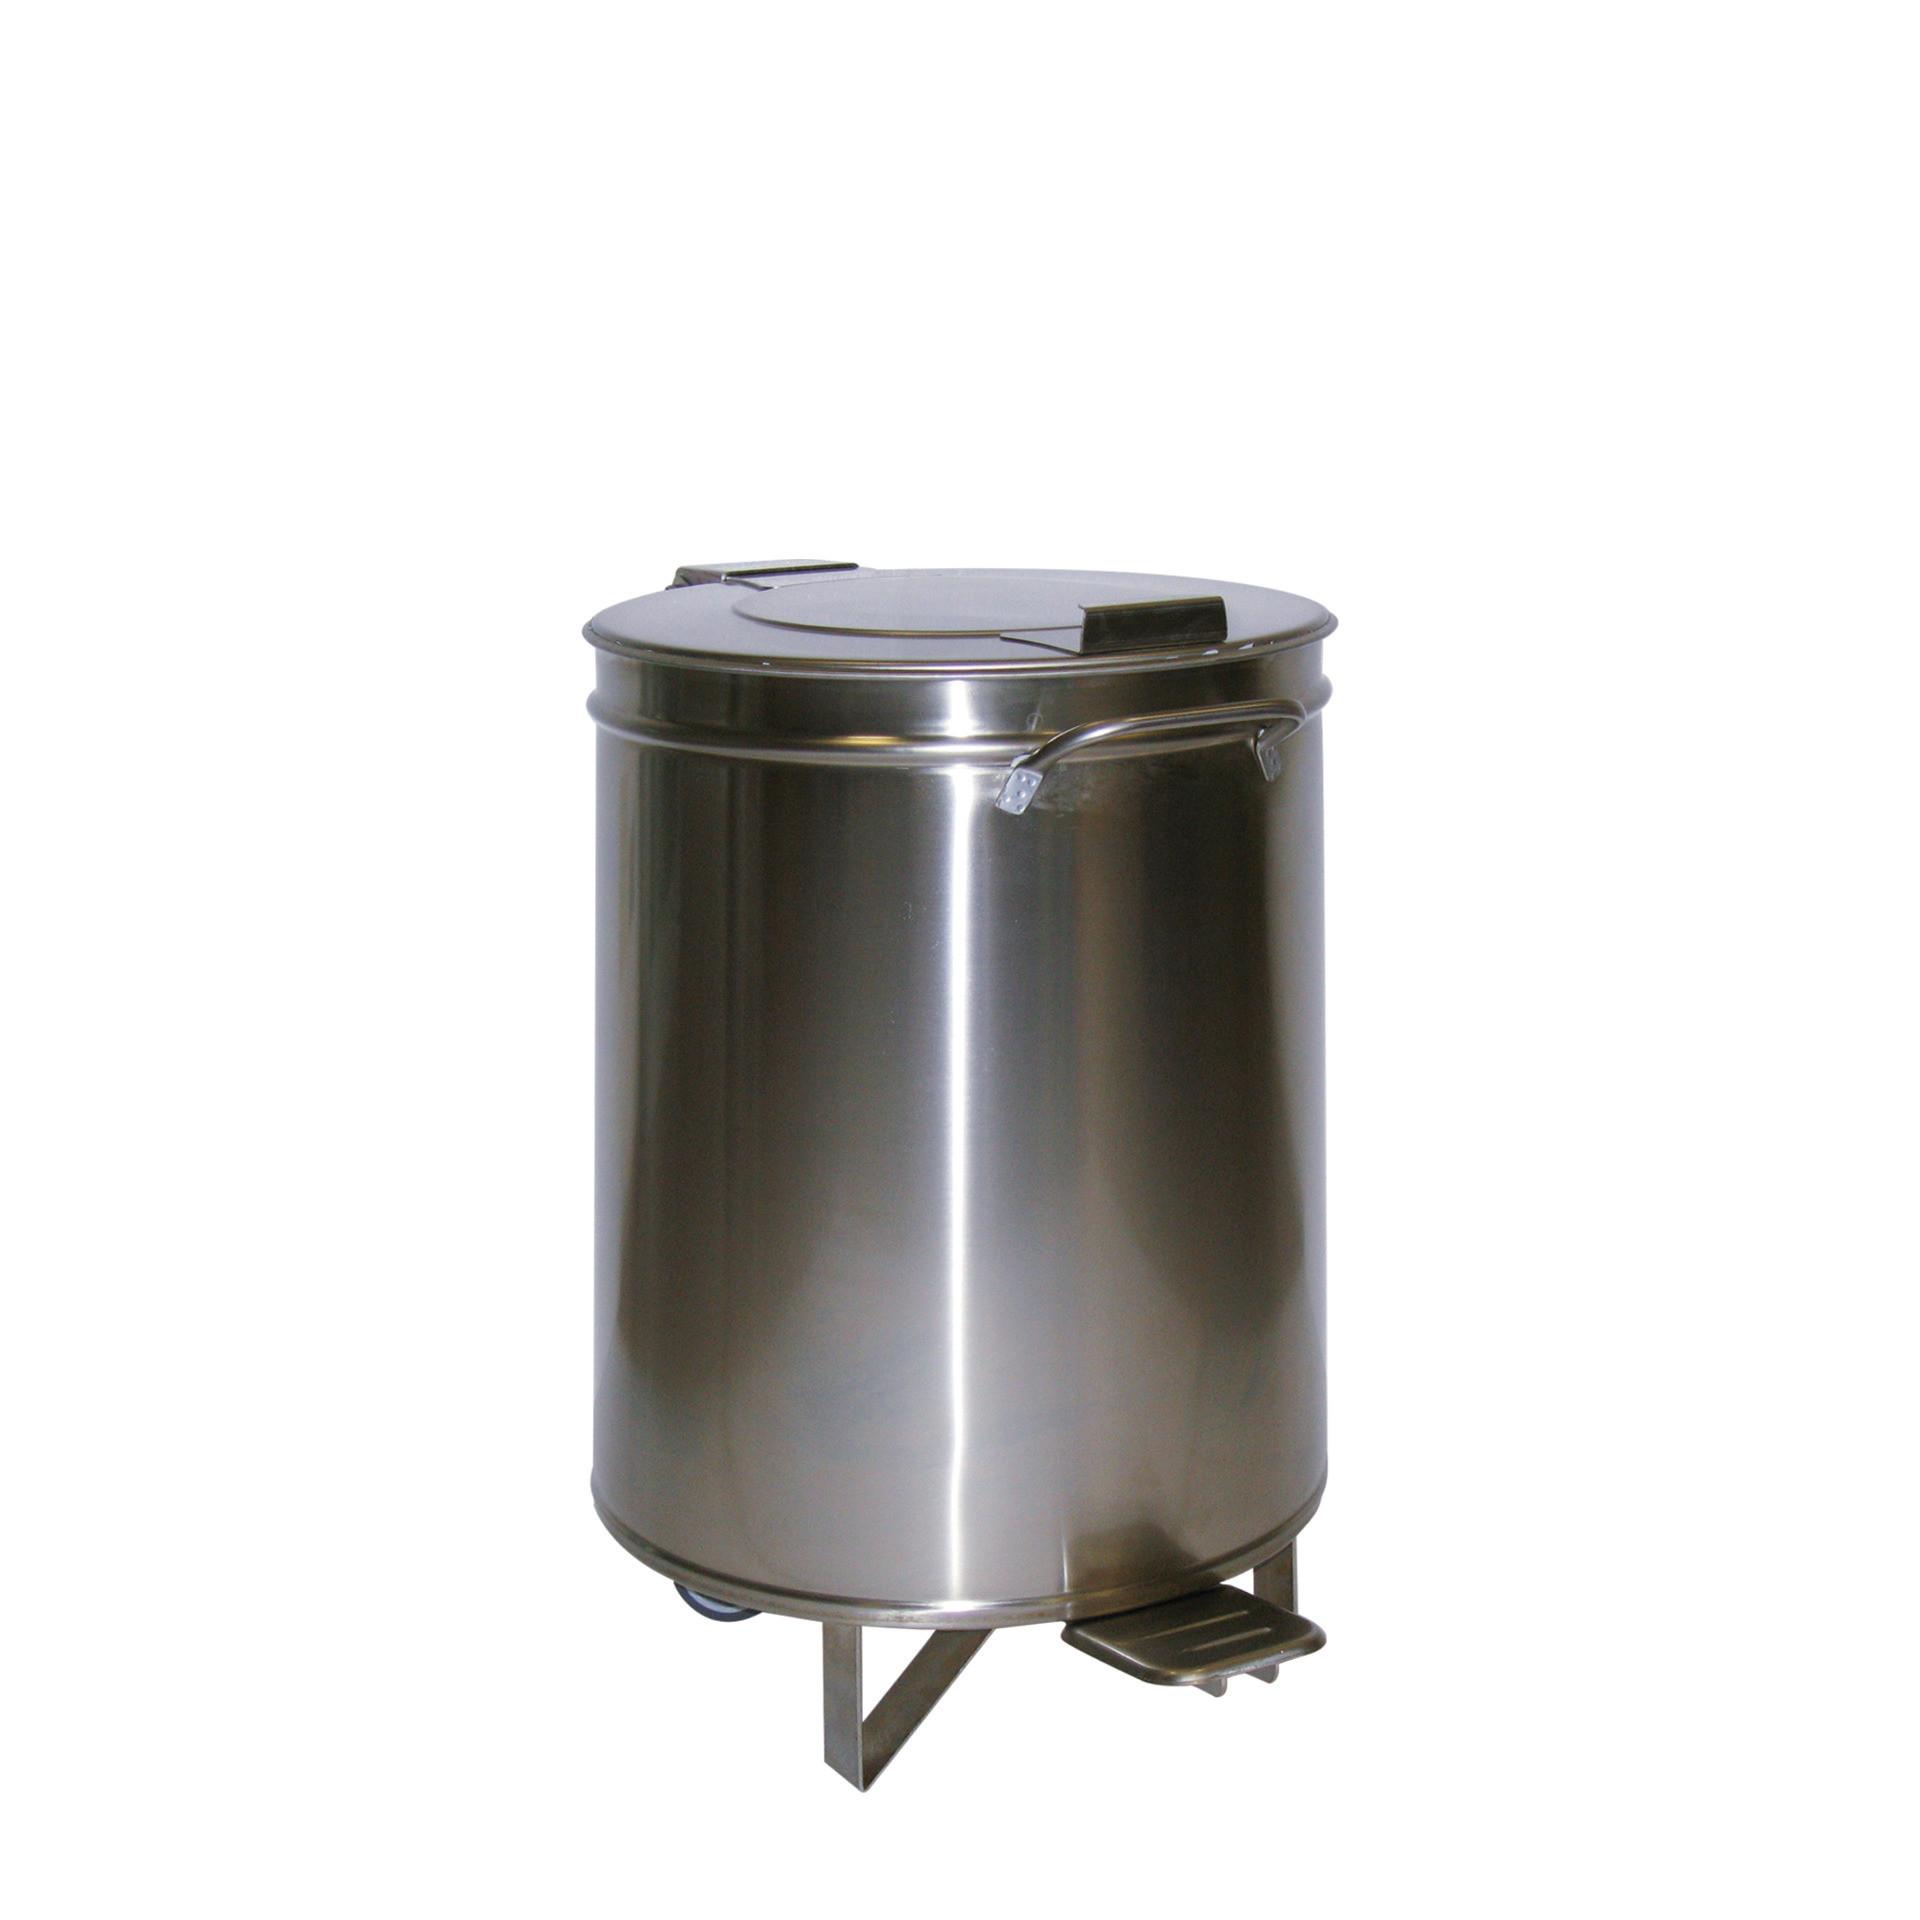 Abfalleimer 50 l ø 380 mm mit Fußpedal und Hub-Deckel 380 x 380 x 605 mm